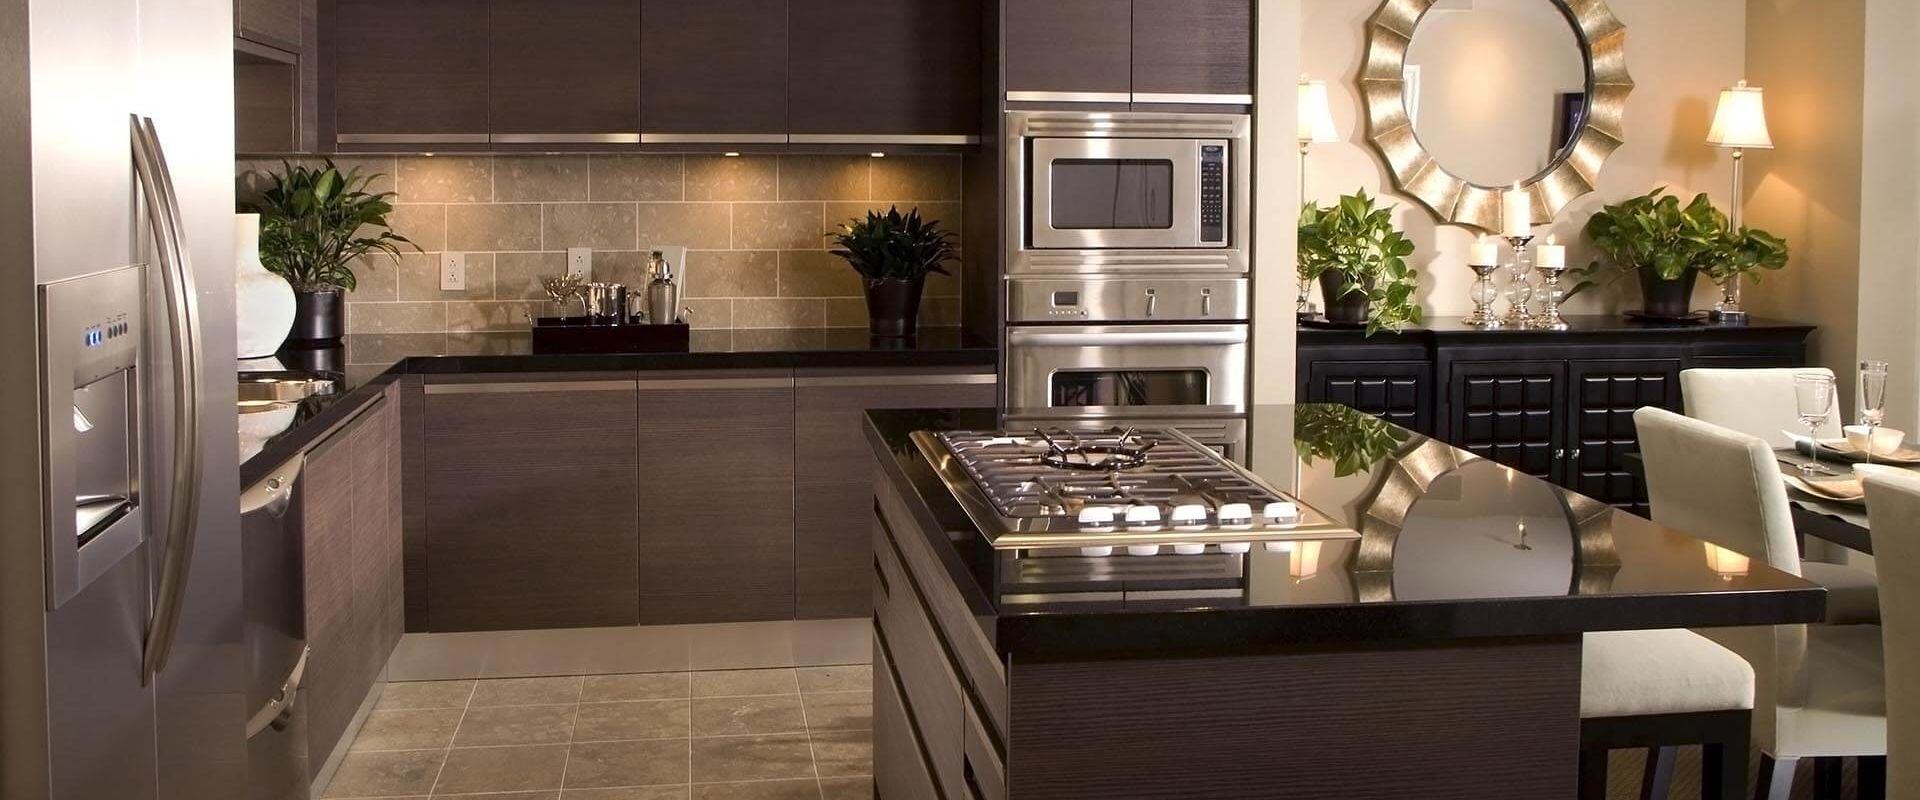 Granite Countertops Denver Kitchen Design Denver Stone City